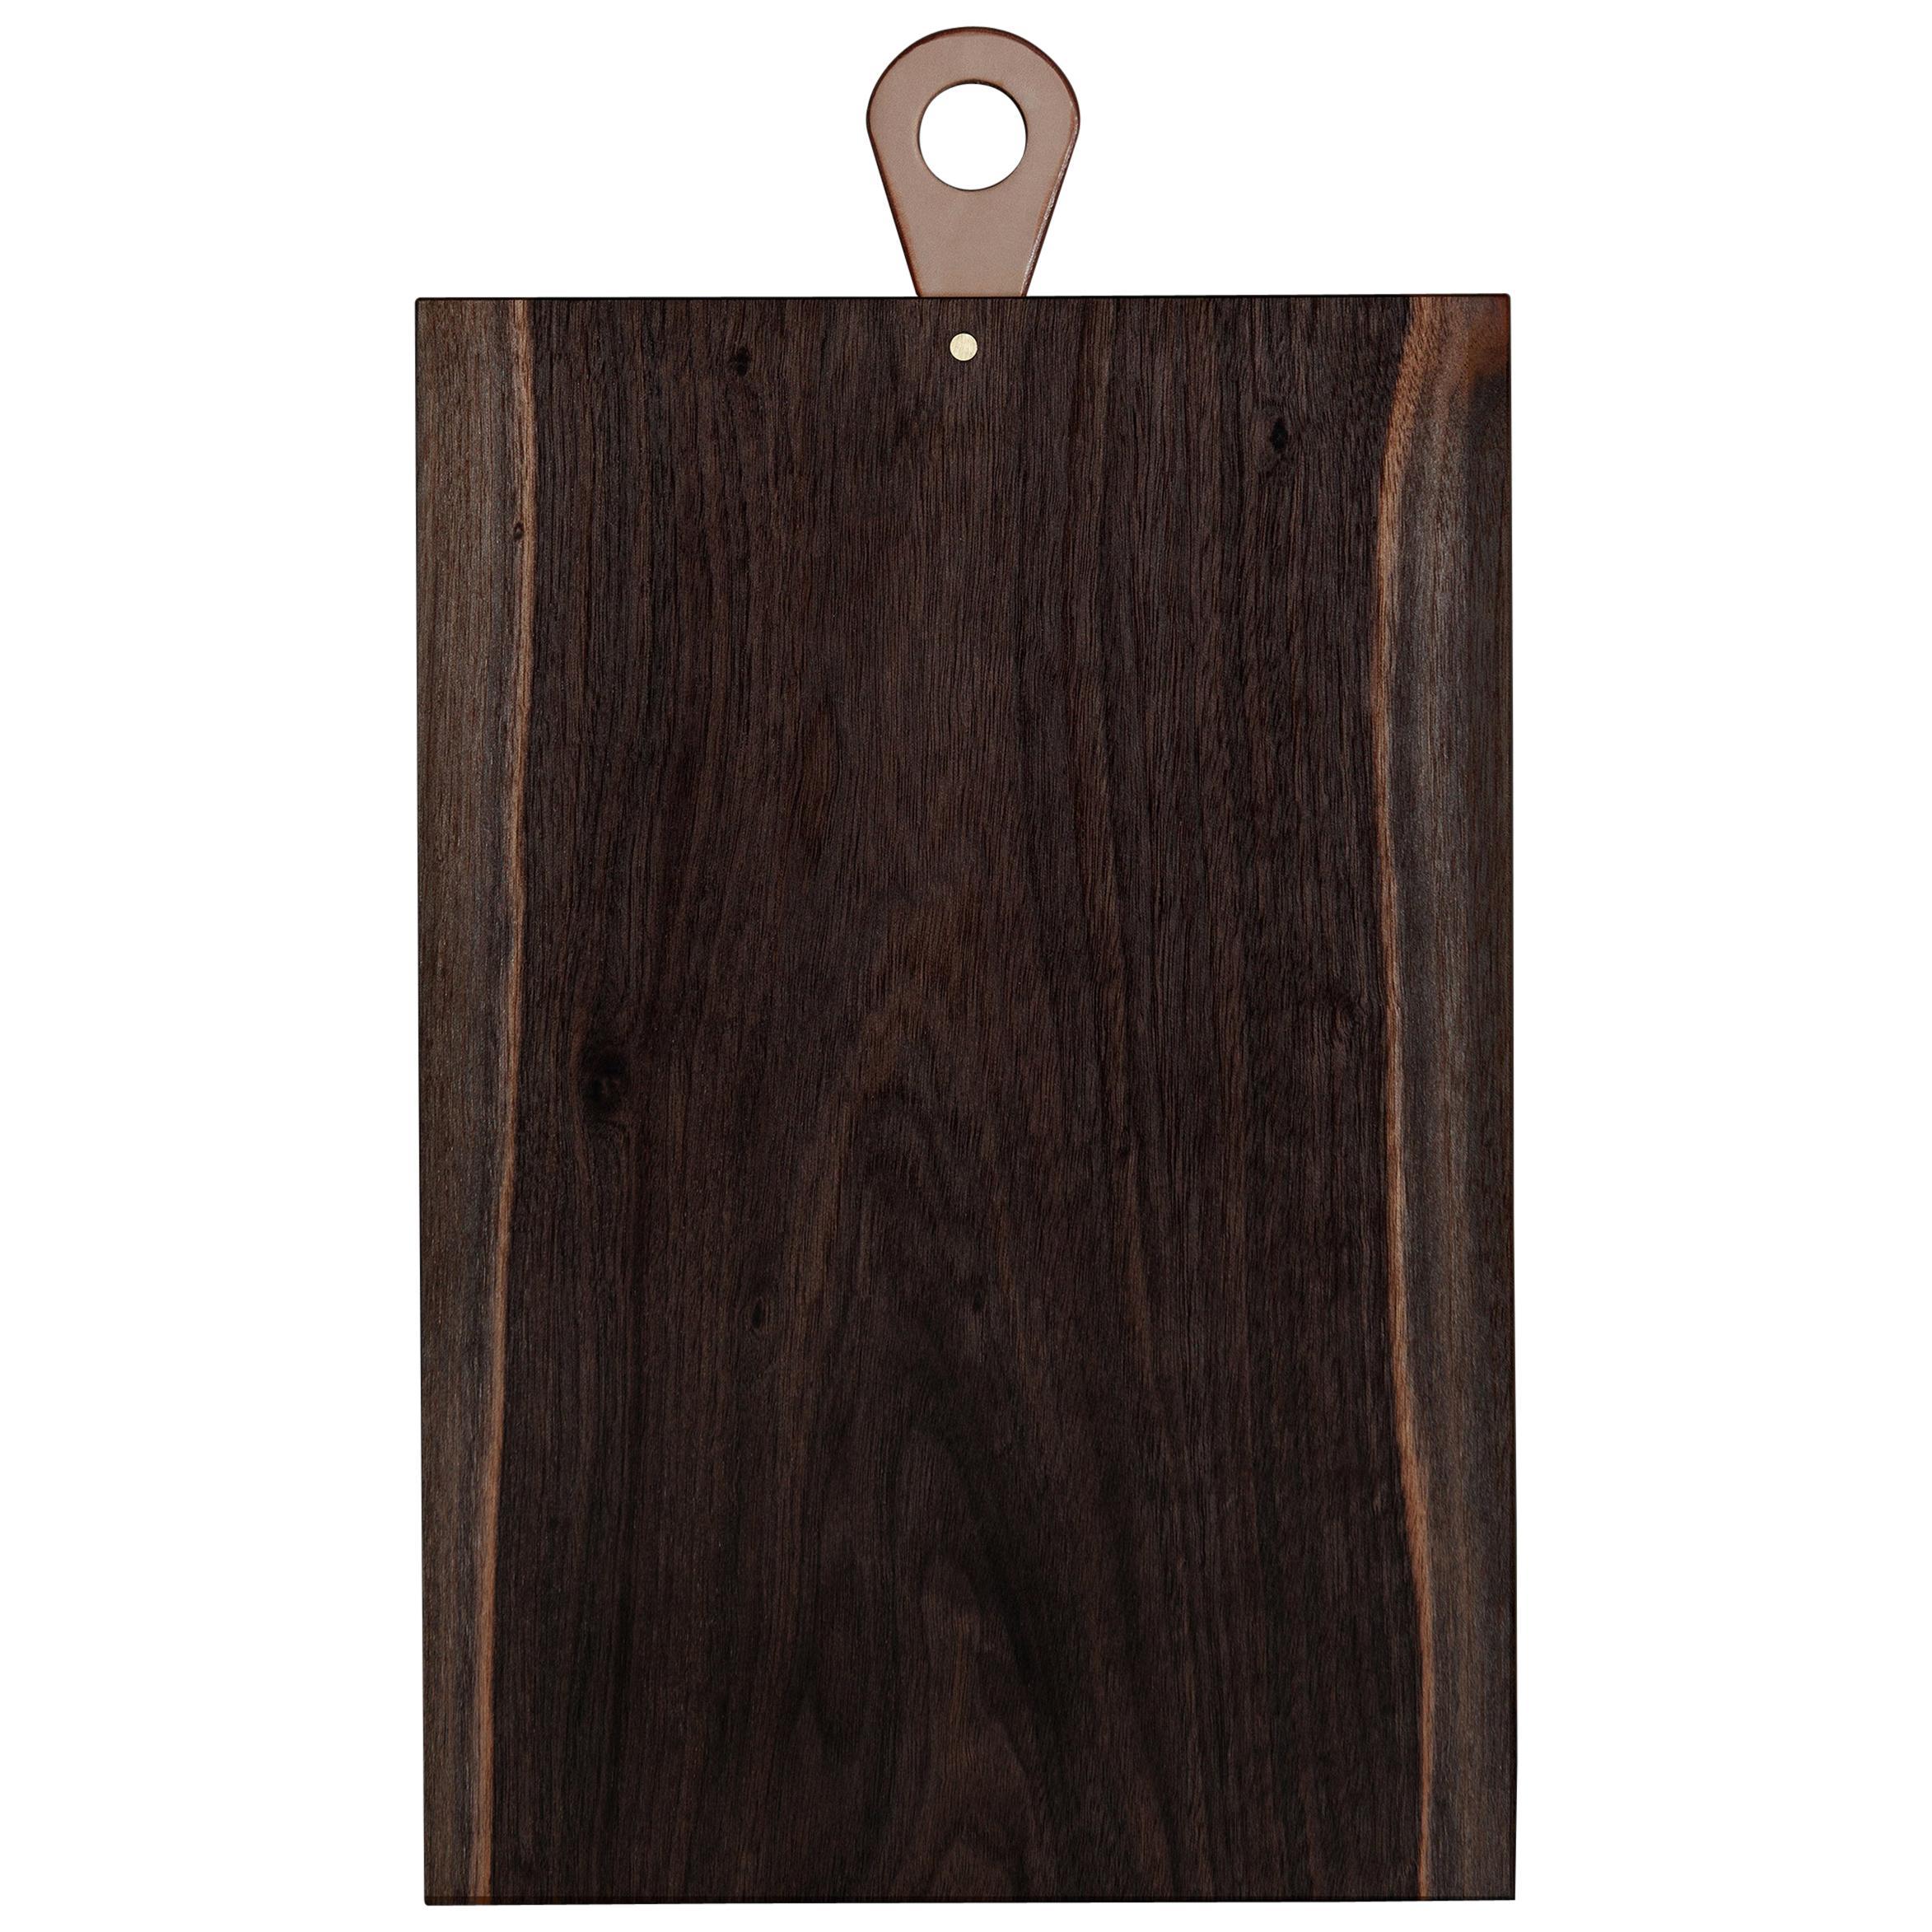 Saddle Cutting/ Serving Board Rectangle in Walnut by Bowen Liu- In Stock